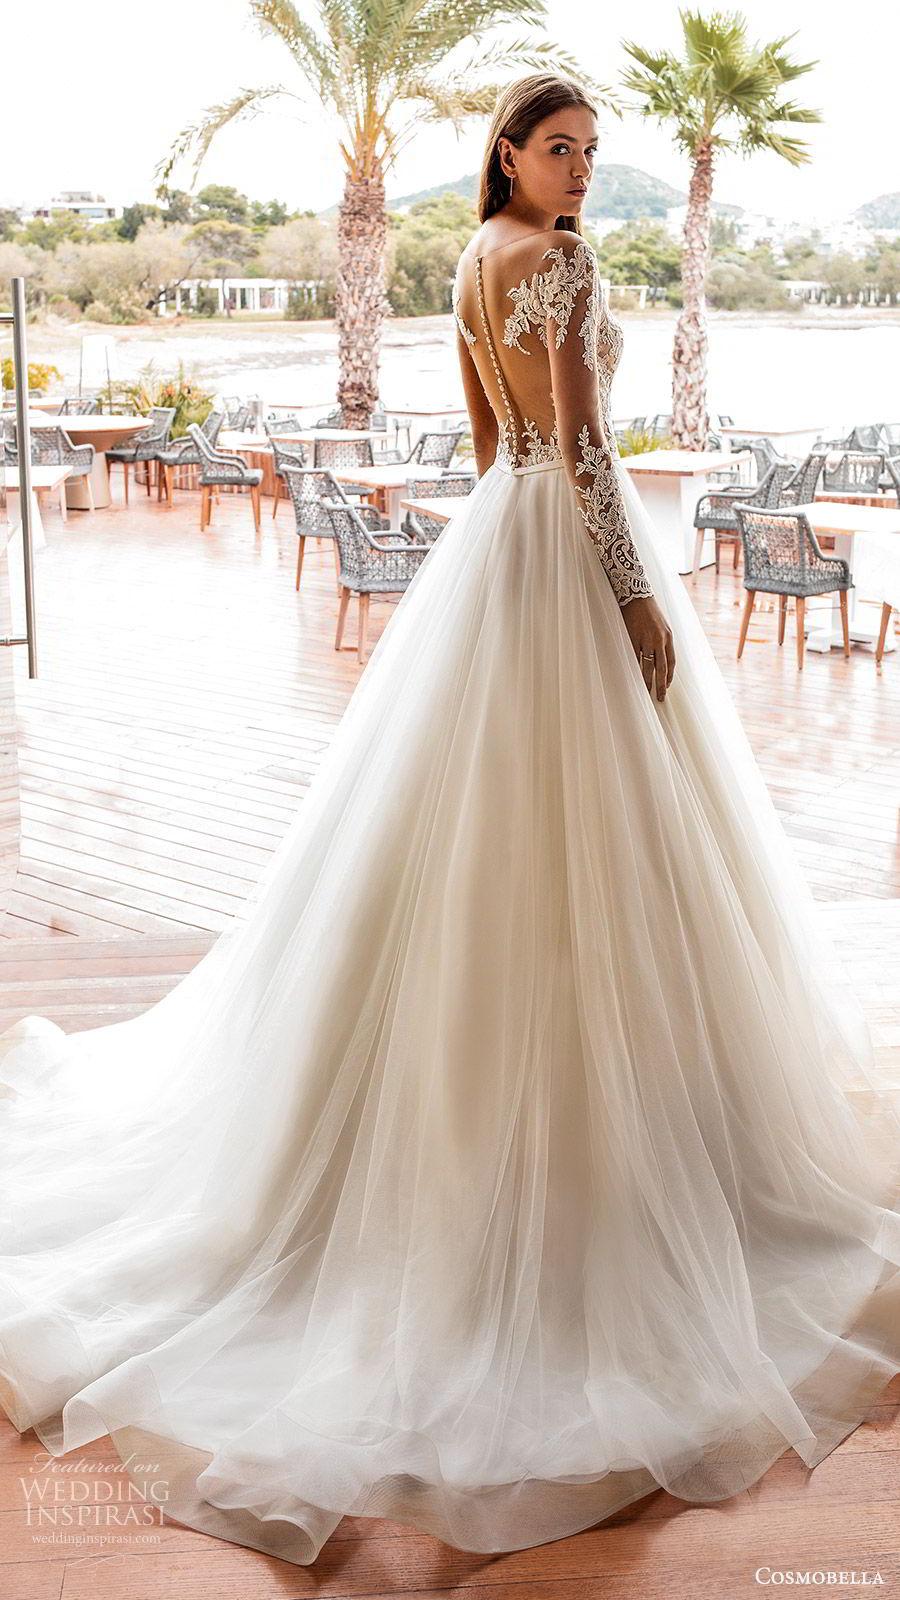 cosmobella 2020 bridal illusion long sleeves sheer bateau sweetheart lace bodice a line ball gown wedding dress (1) ivory romantic princess chapel train bv